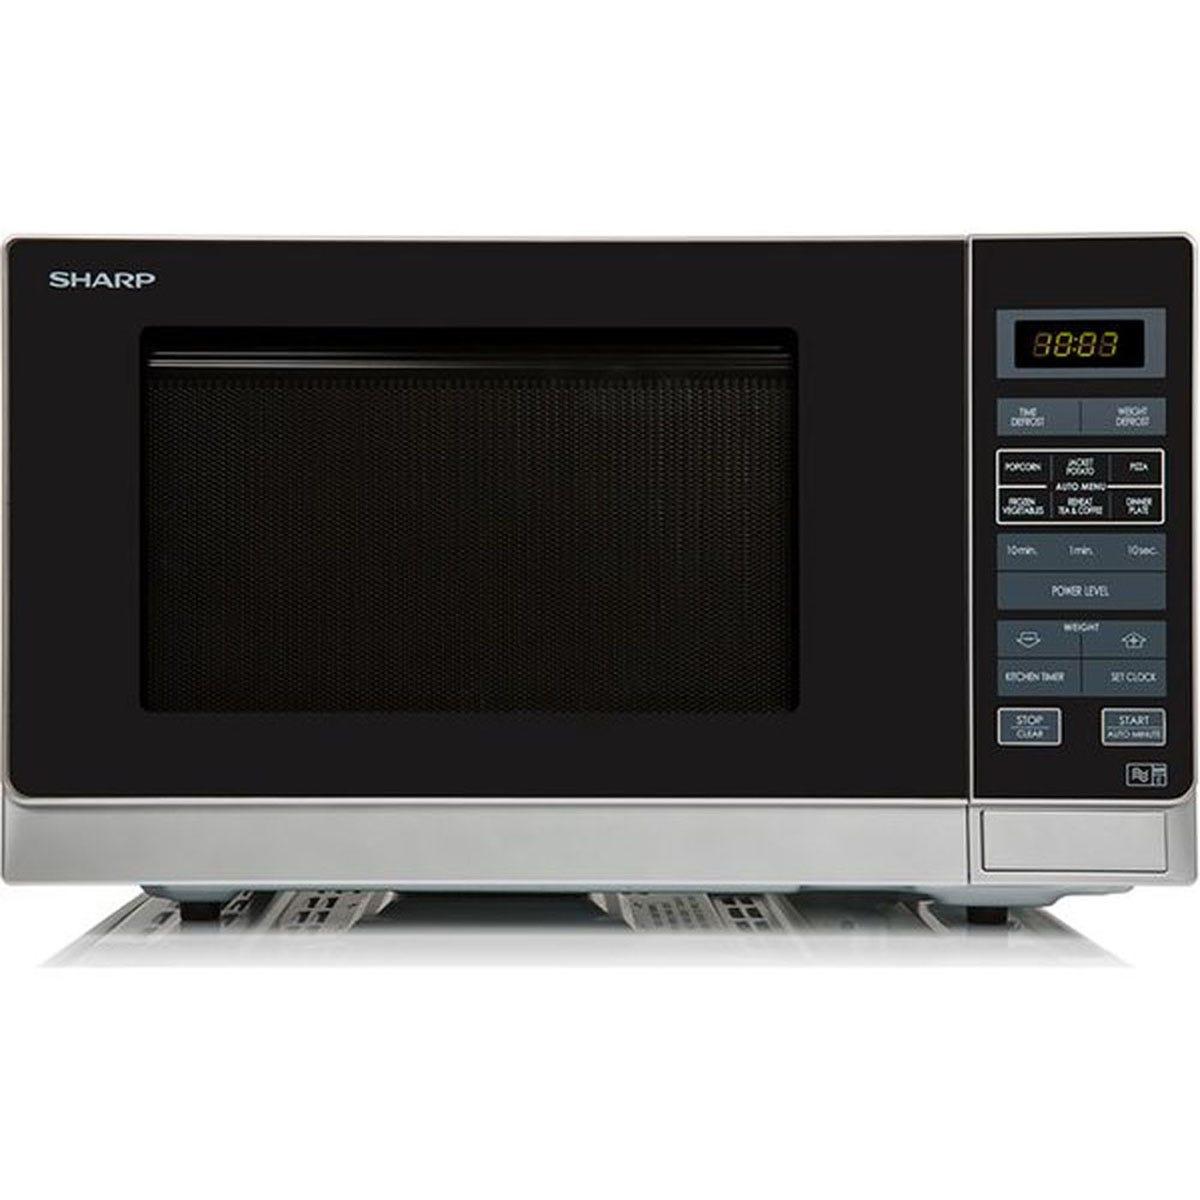 Sharp R372SLM 25L 900W Solo Digital Microwave - Silver